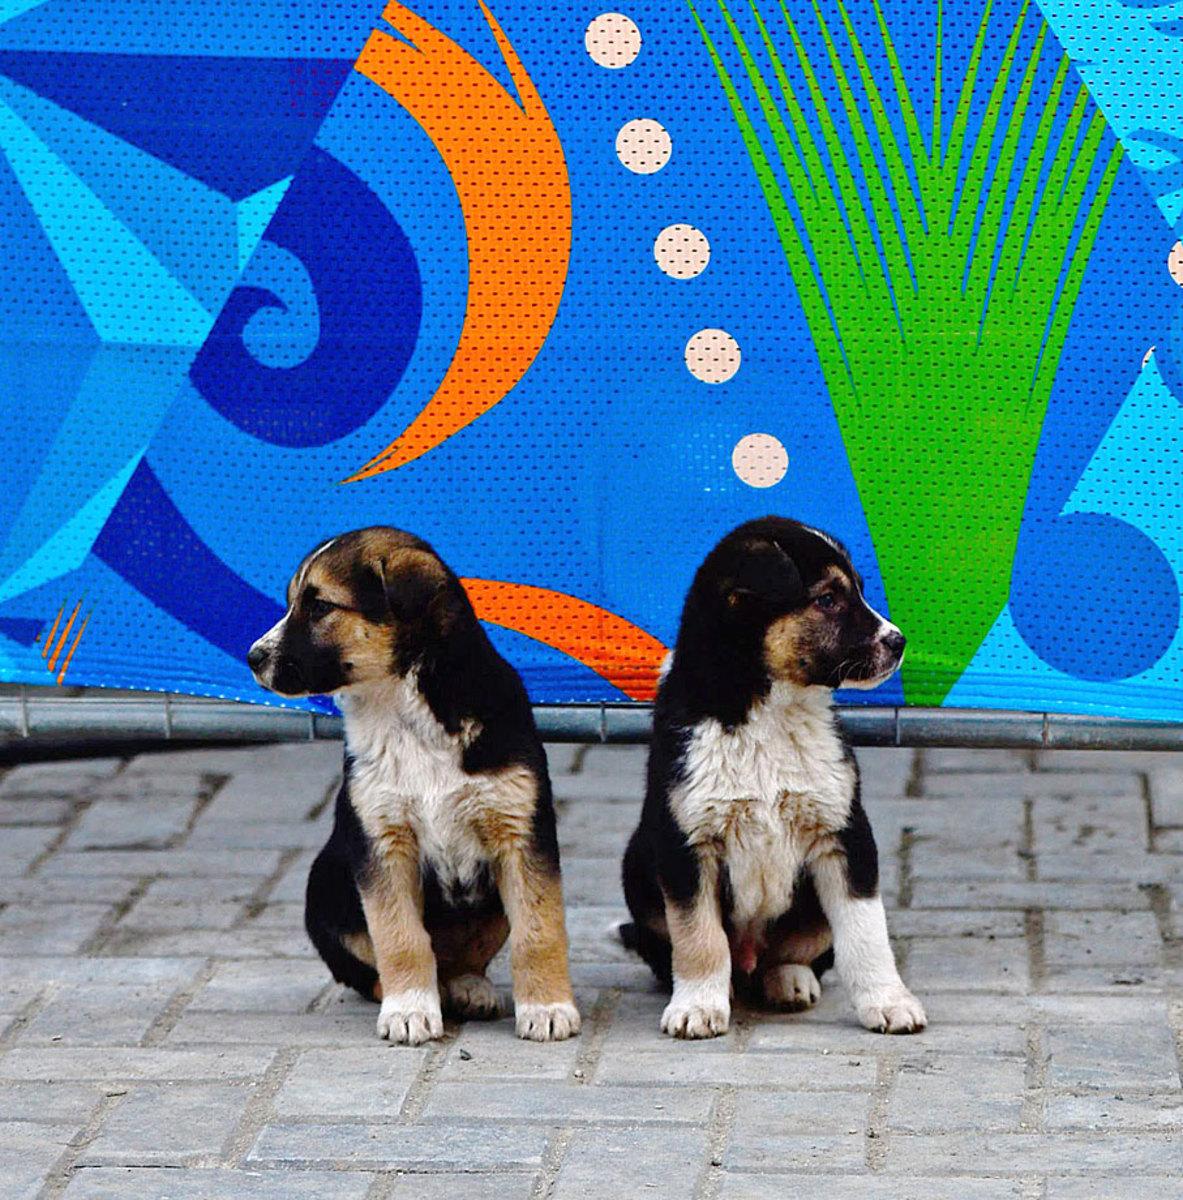 sochi-olympics-stray-dogs-opbc-1867.jpg